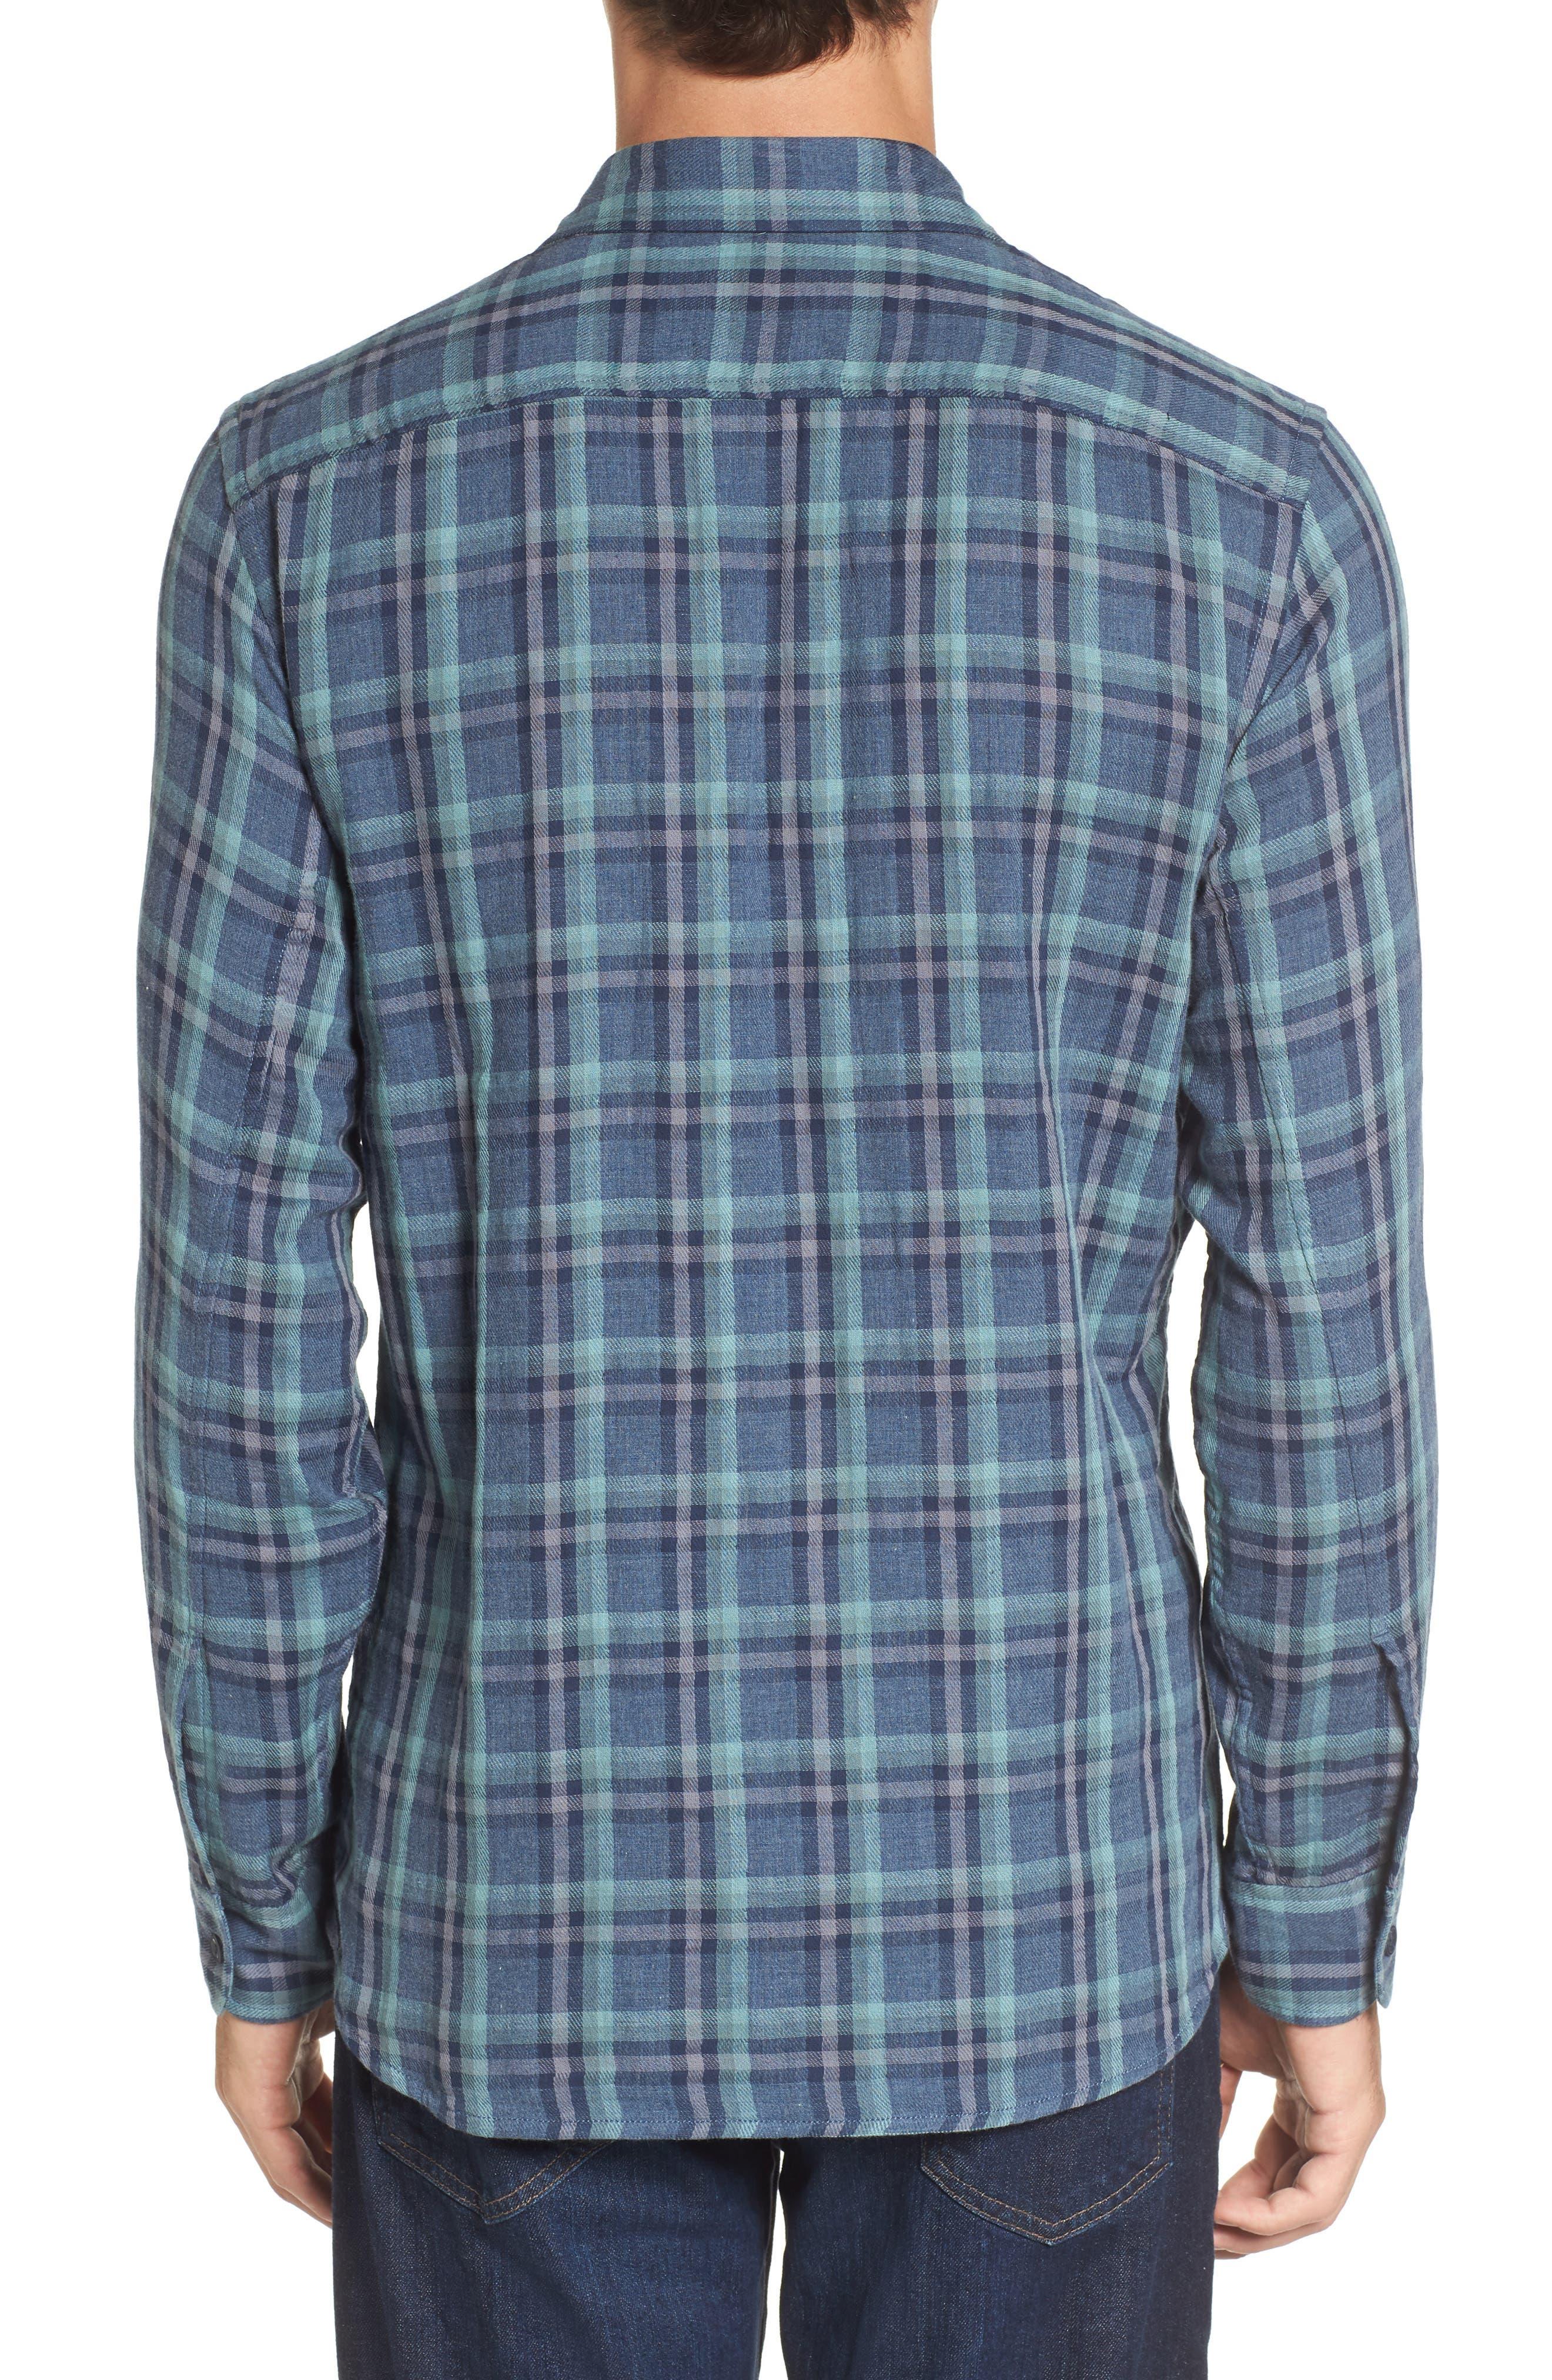 Smith Double Cloth Plaid Sport Shirt,                             Alternate thumbnail 2, color,                             460